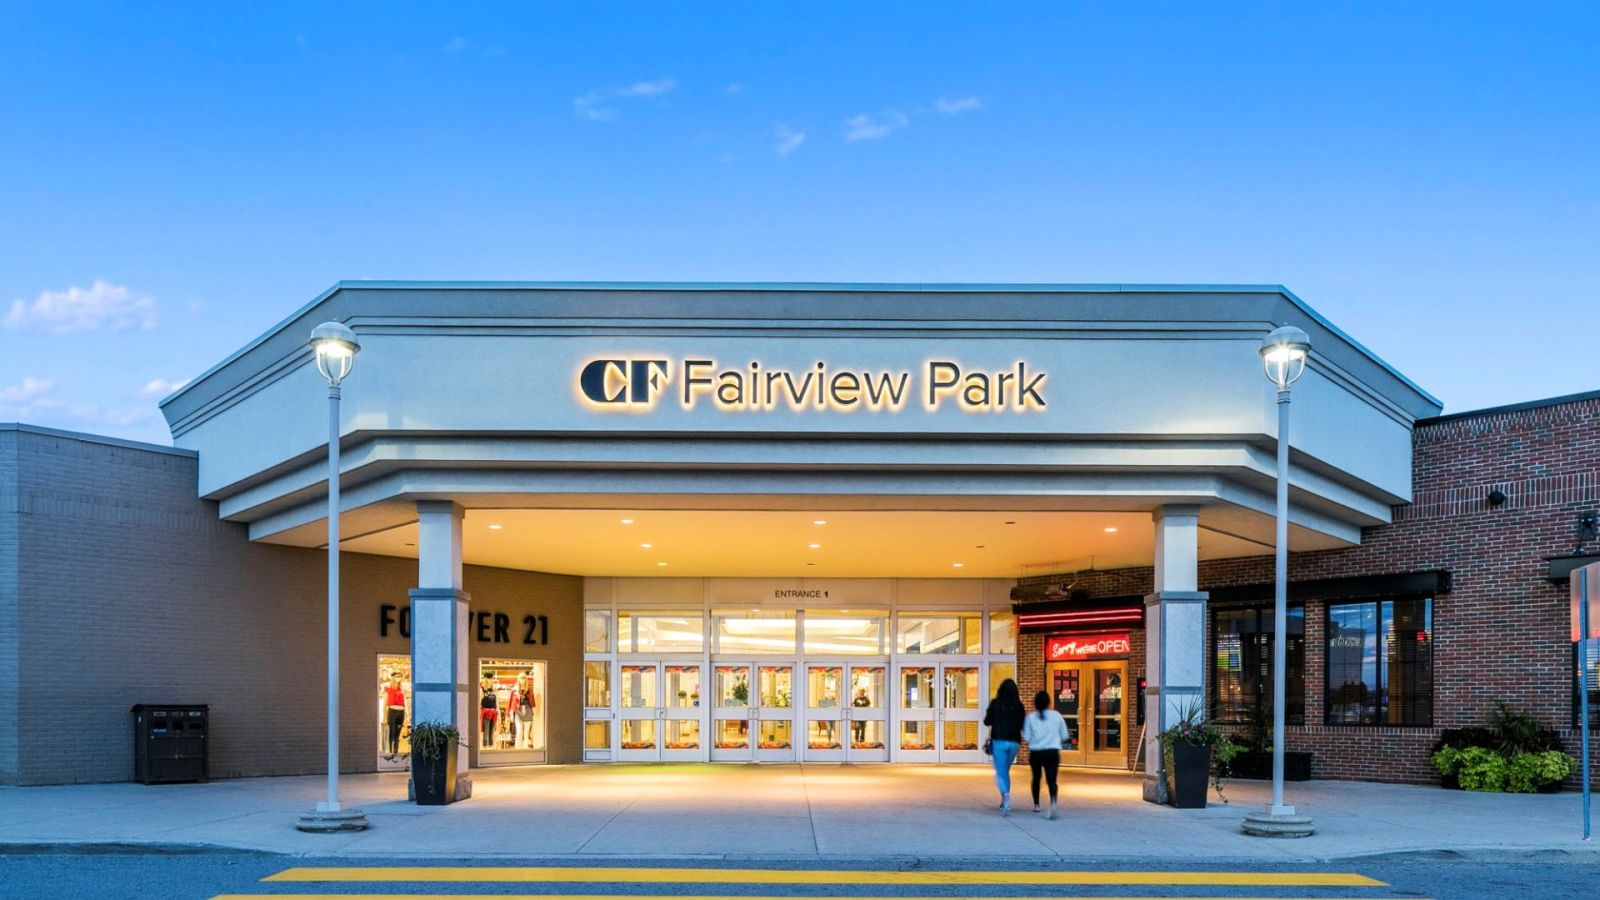 [CF Fairview Park] Opengraph